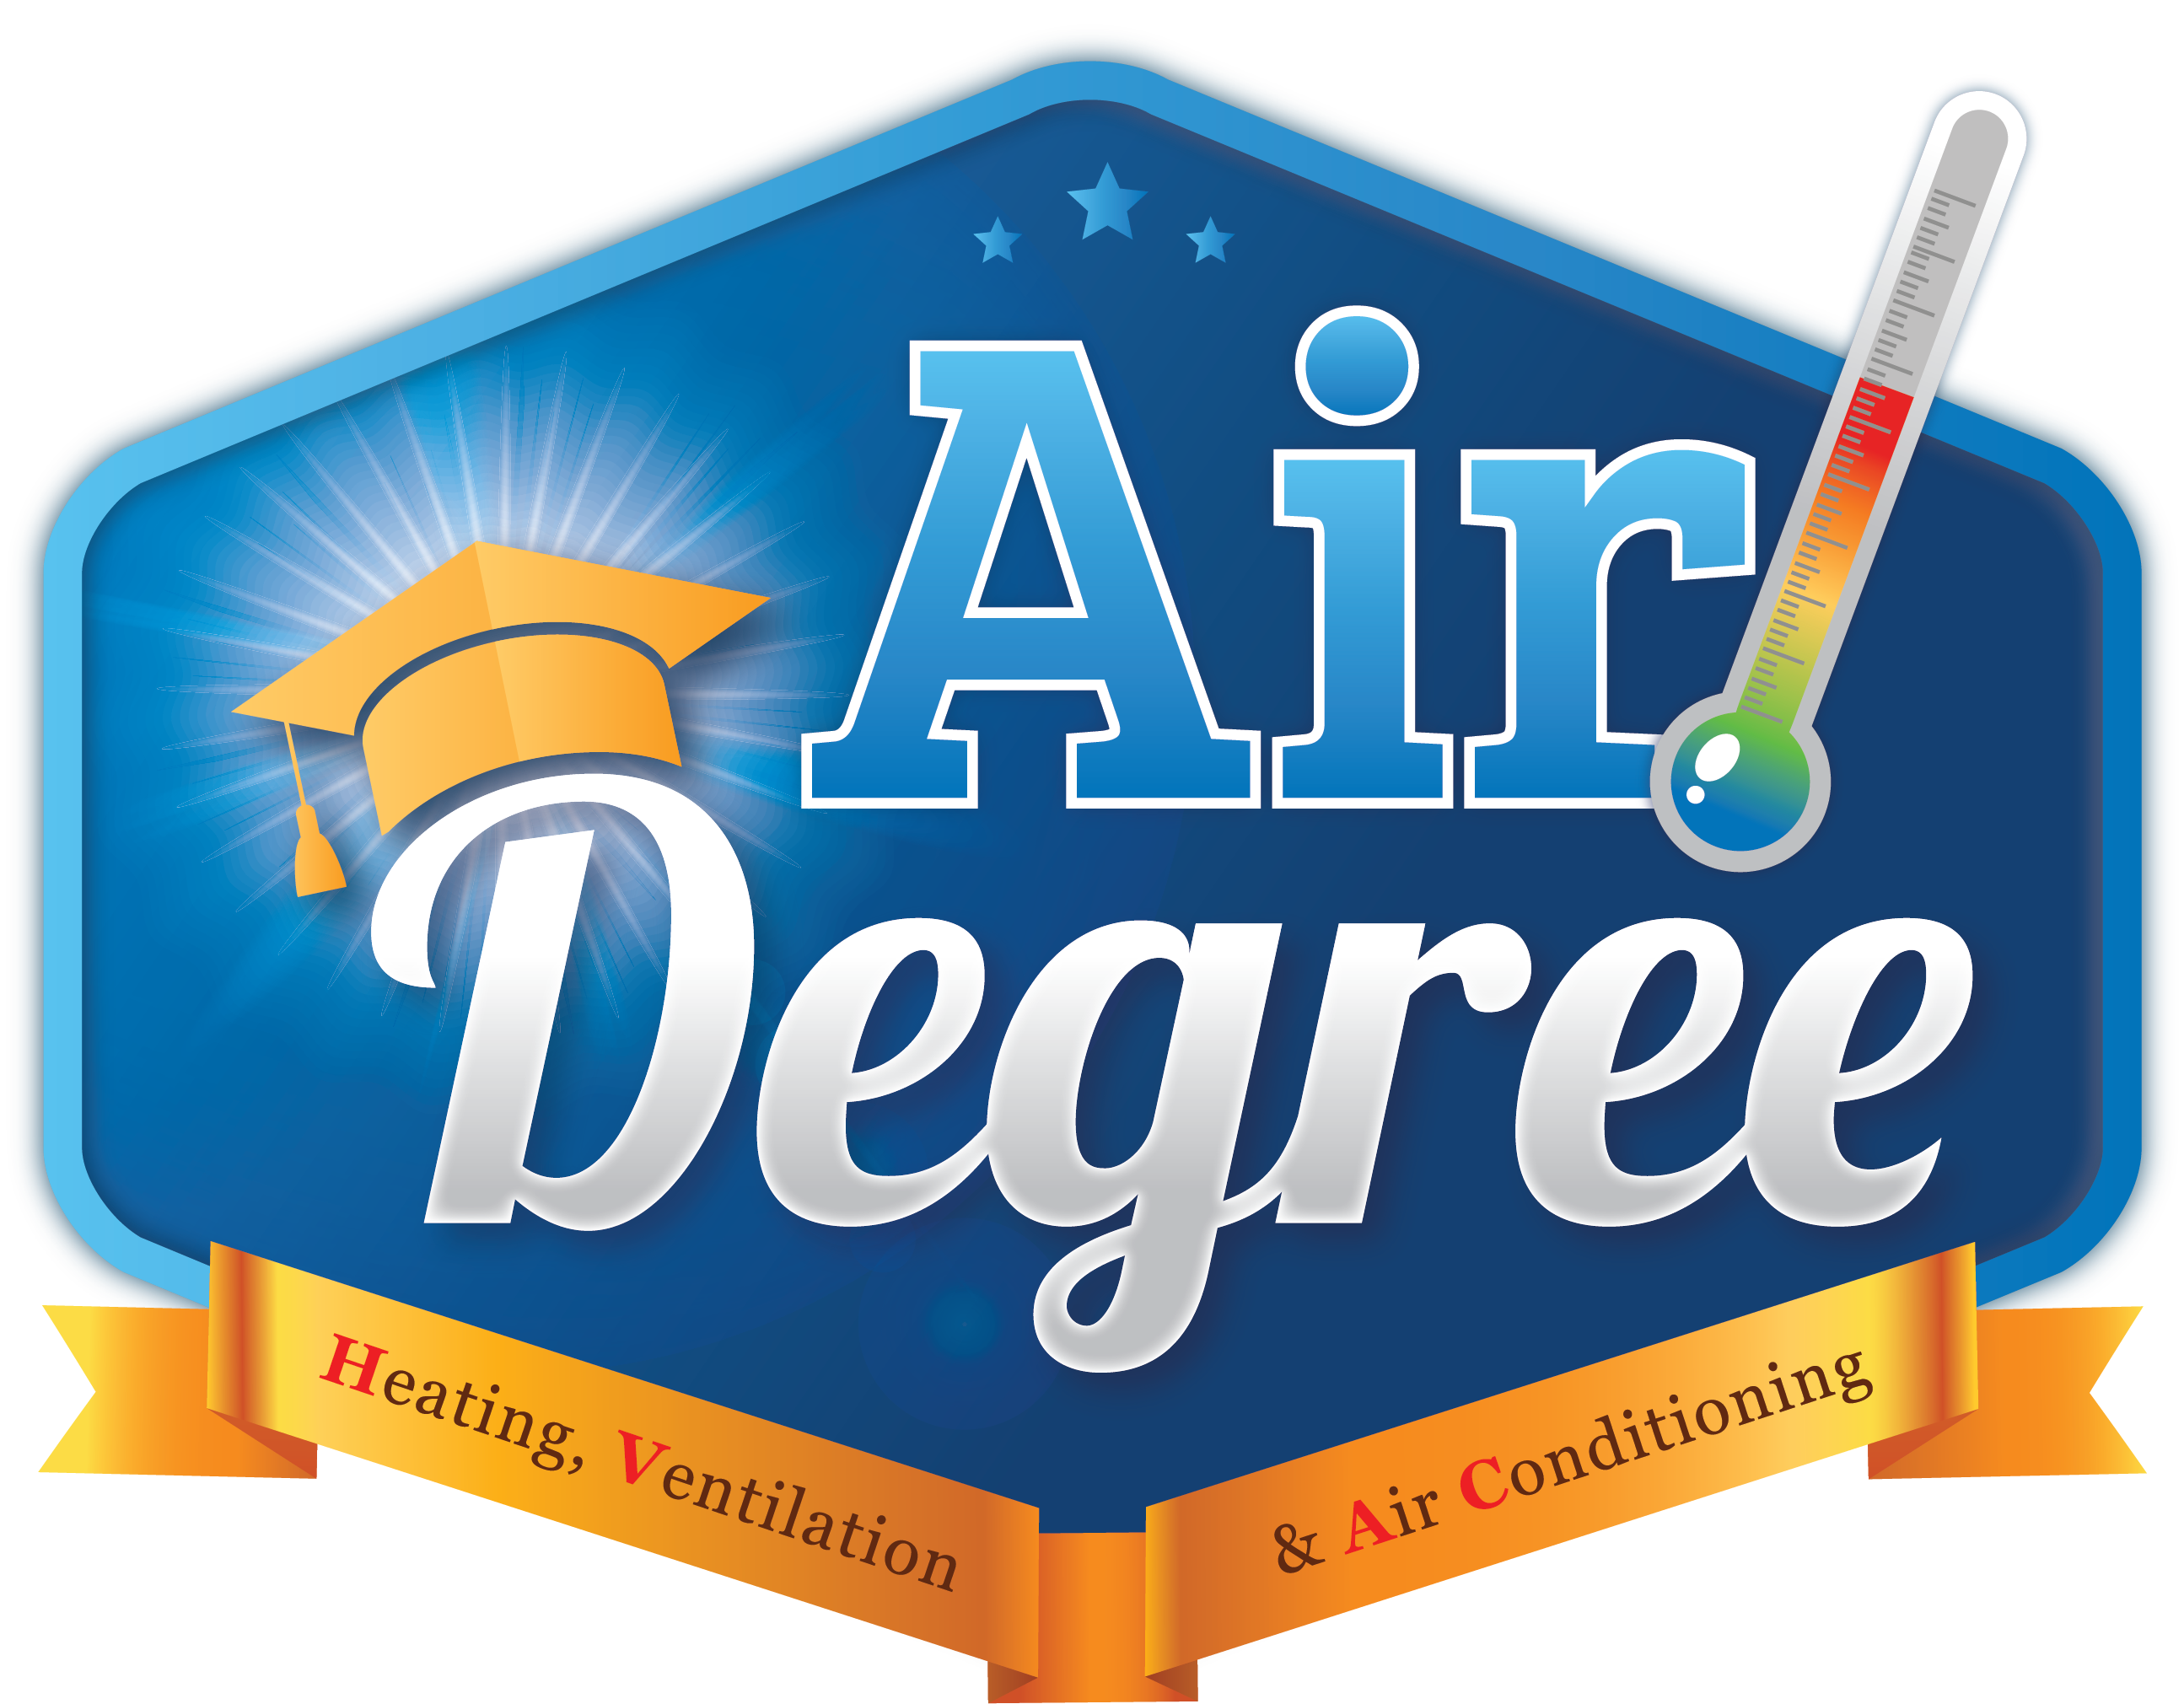 airdegree_logo.png